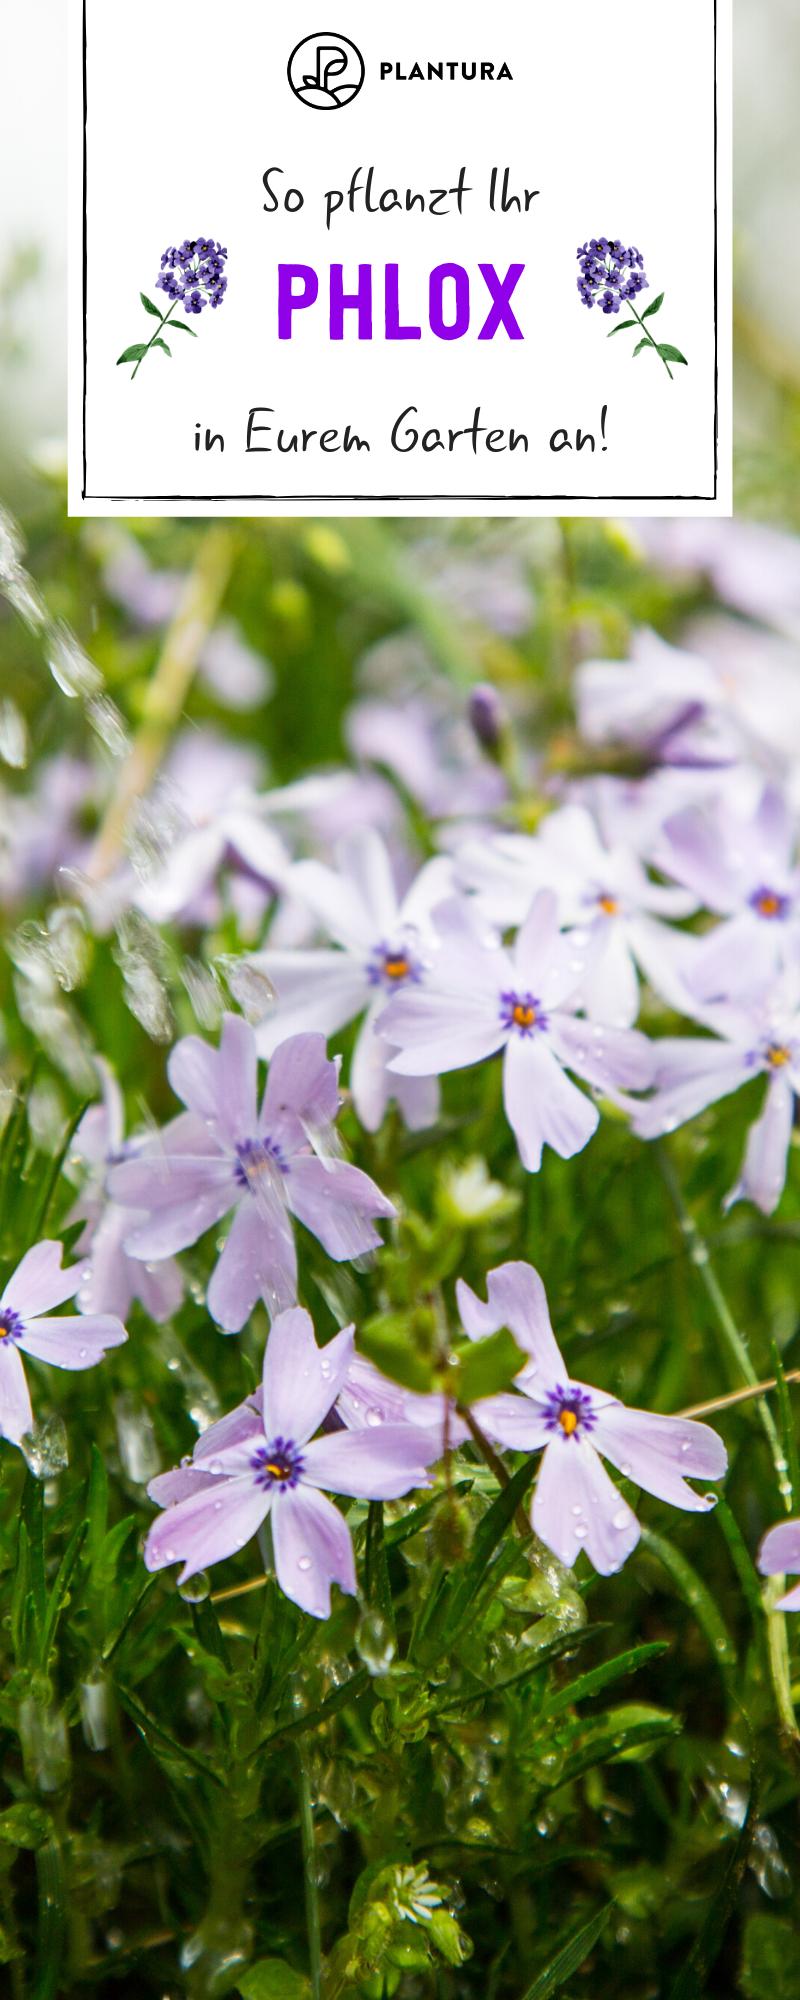 Phlox Experten Tipps Zum Pflanzen Pflegen Vermehren Plantura Pflanzen Phlox Pflanze Rosen Pflegen